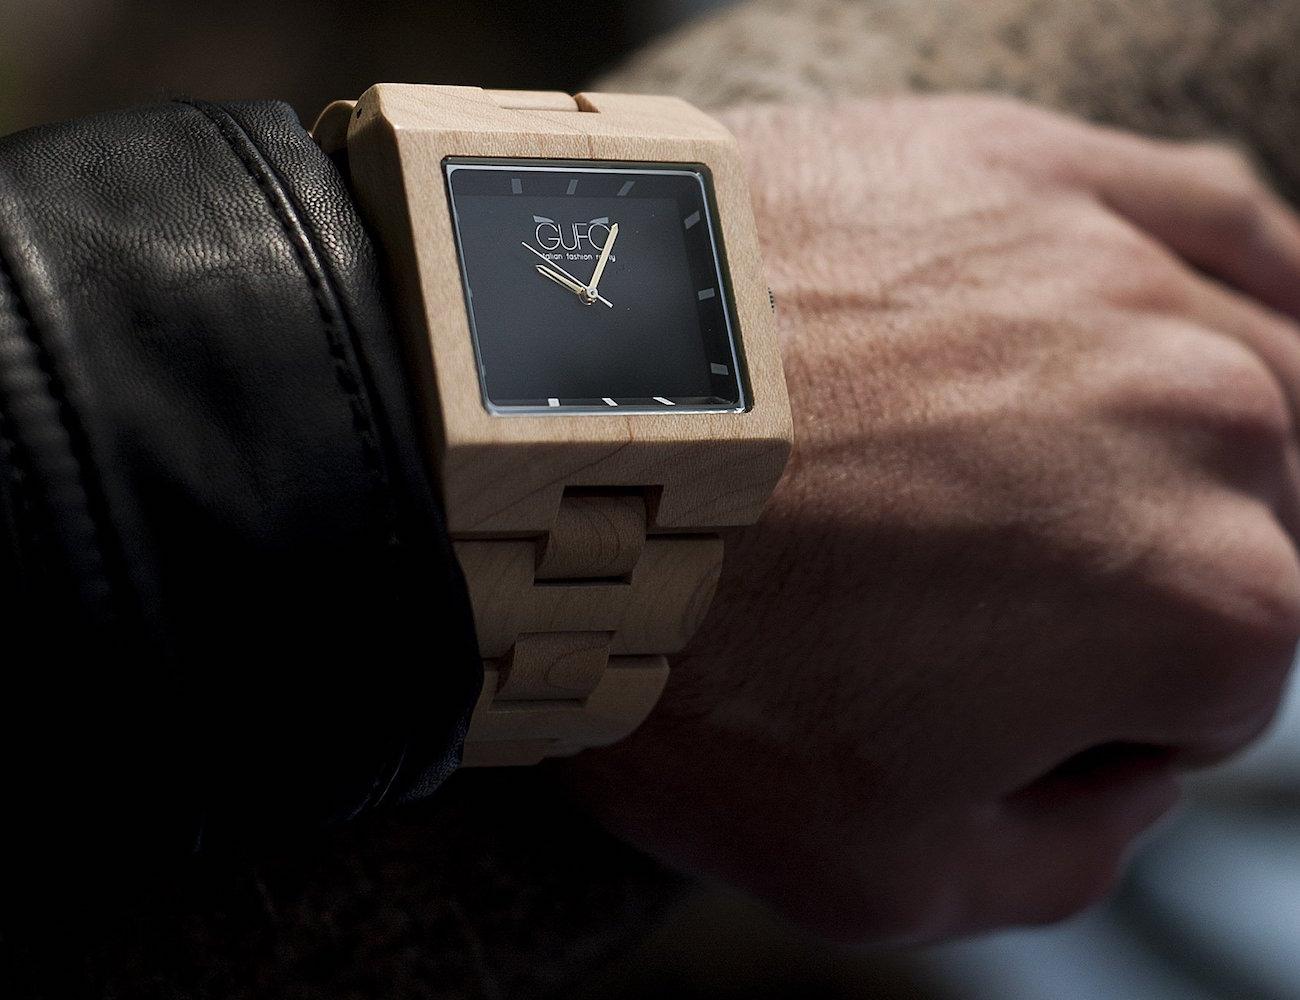 Black Stone Wooden Wrist Watch by GUFO Italy